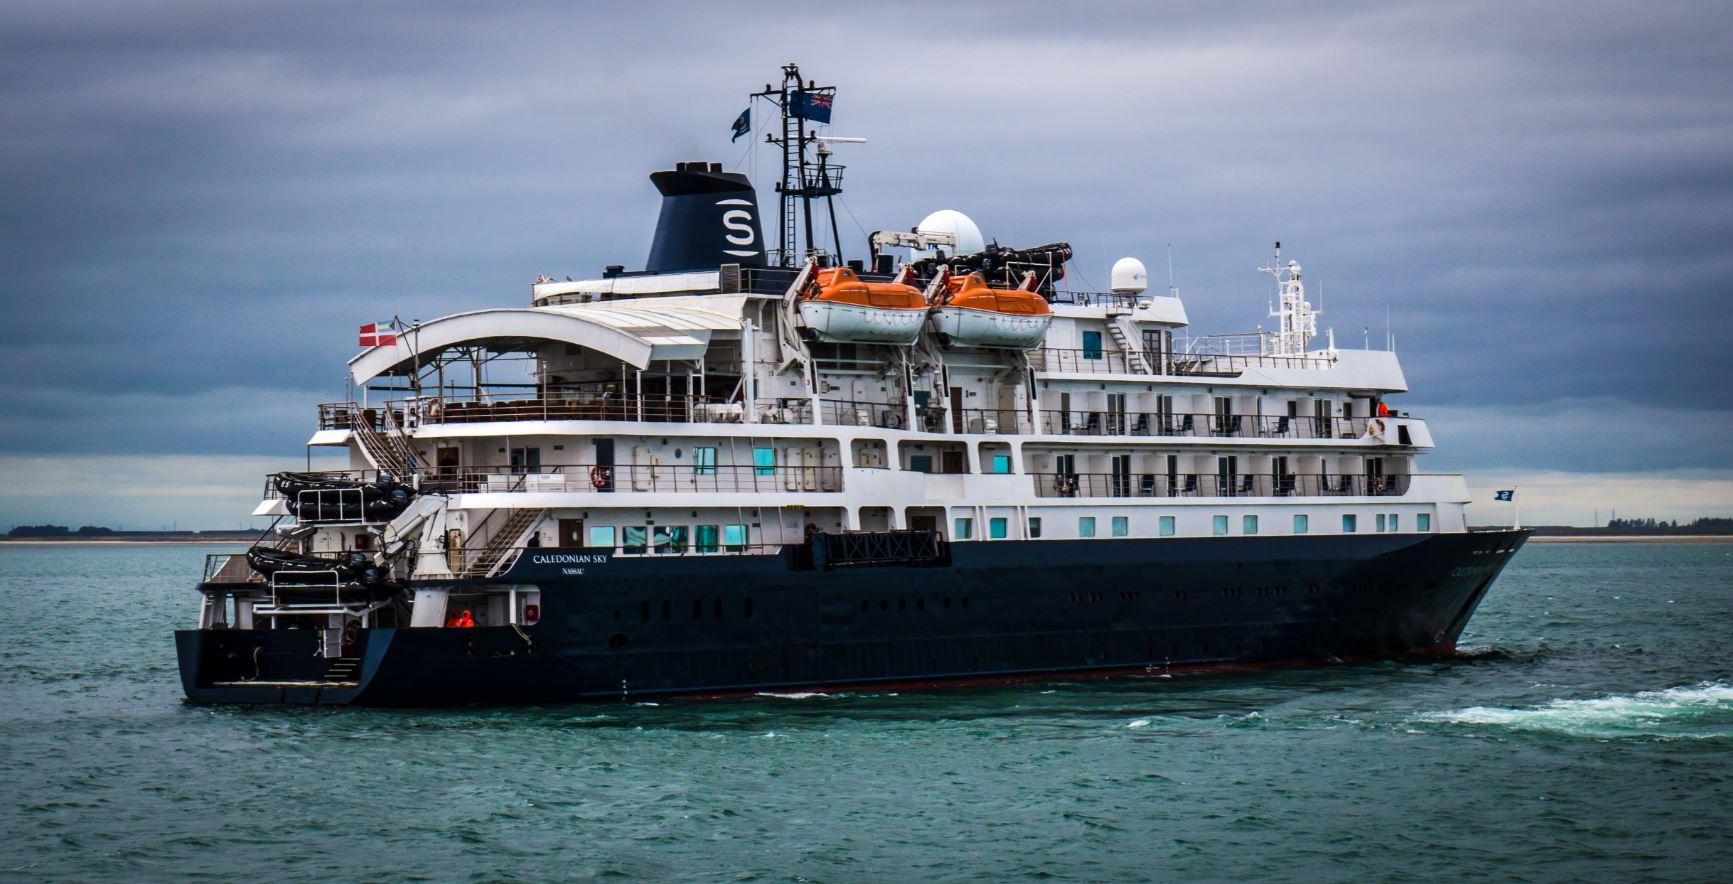 Caledonian Sky, the ship servicing Sub-Antarctic Islands of New Zealand